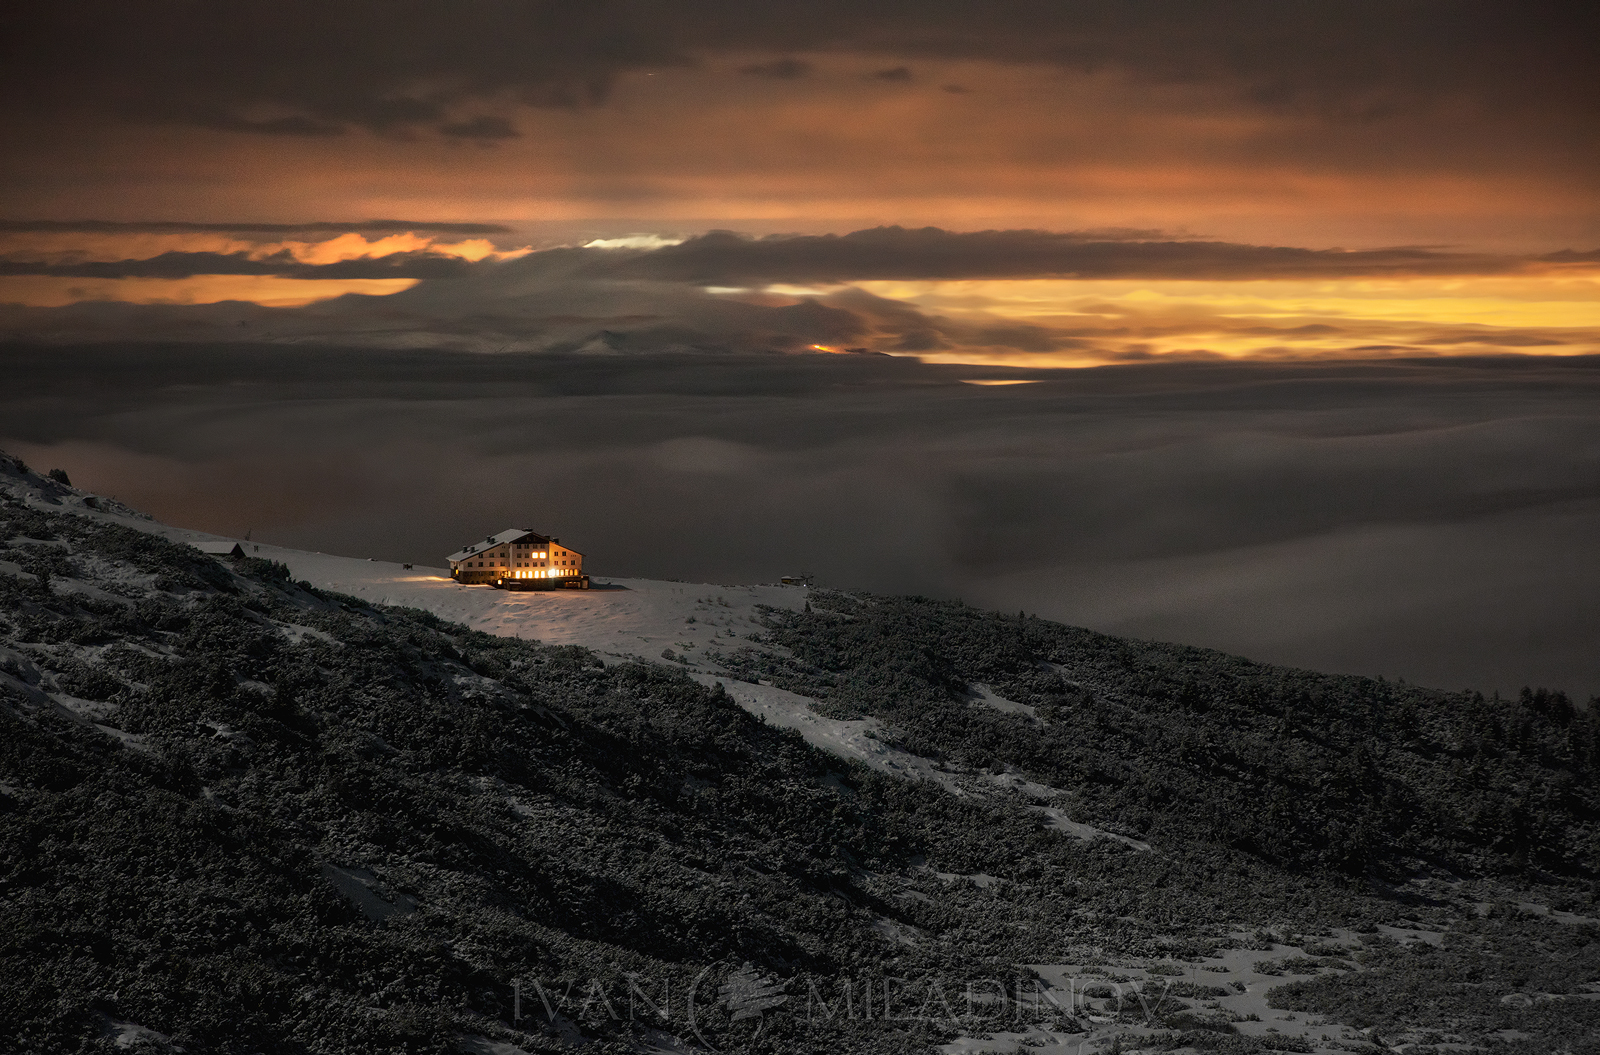 The new hut of Rila lakes